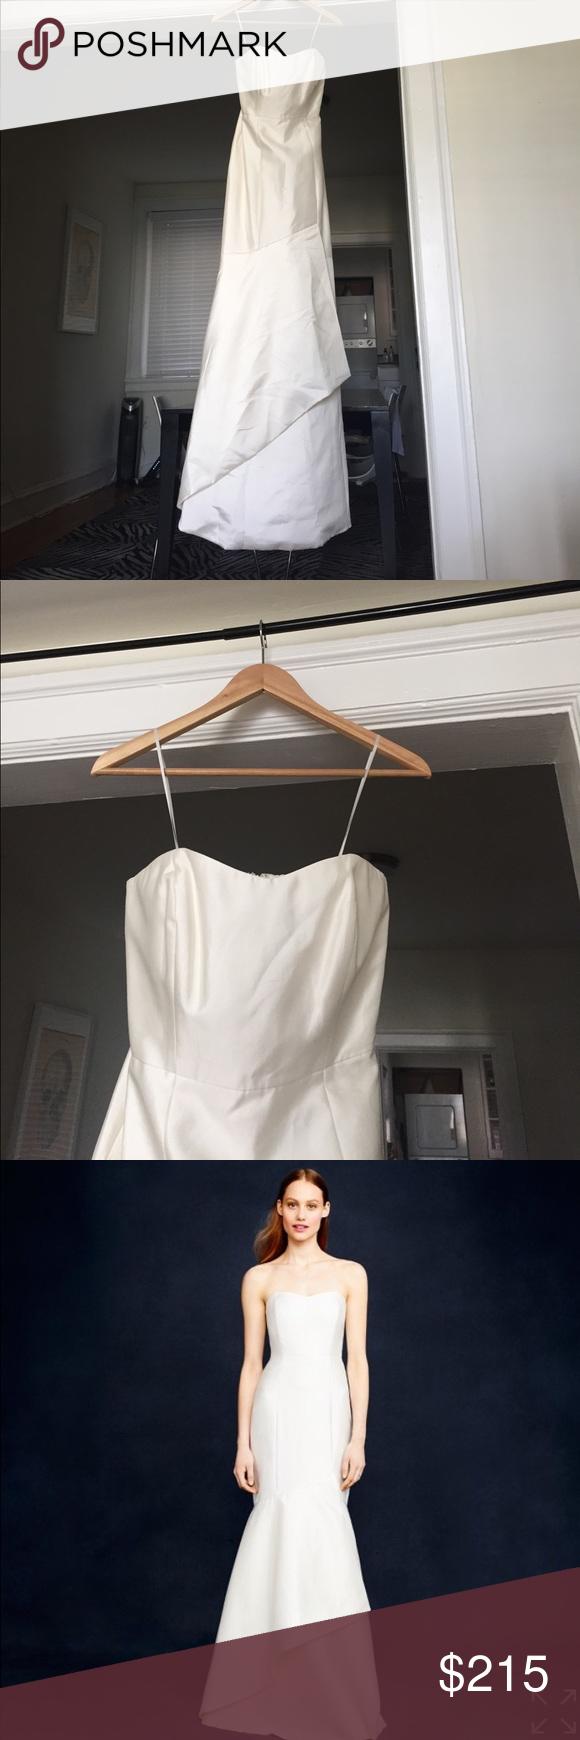 J. Crew Eva Wedding Gown NWT   My Posh Picks   Pinterest   Gowns ...